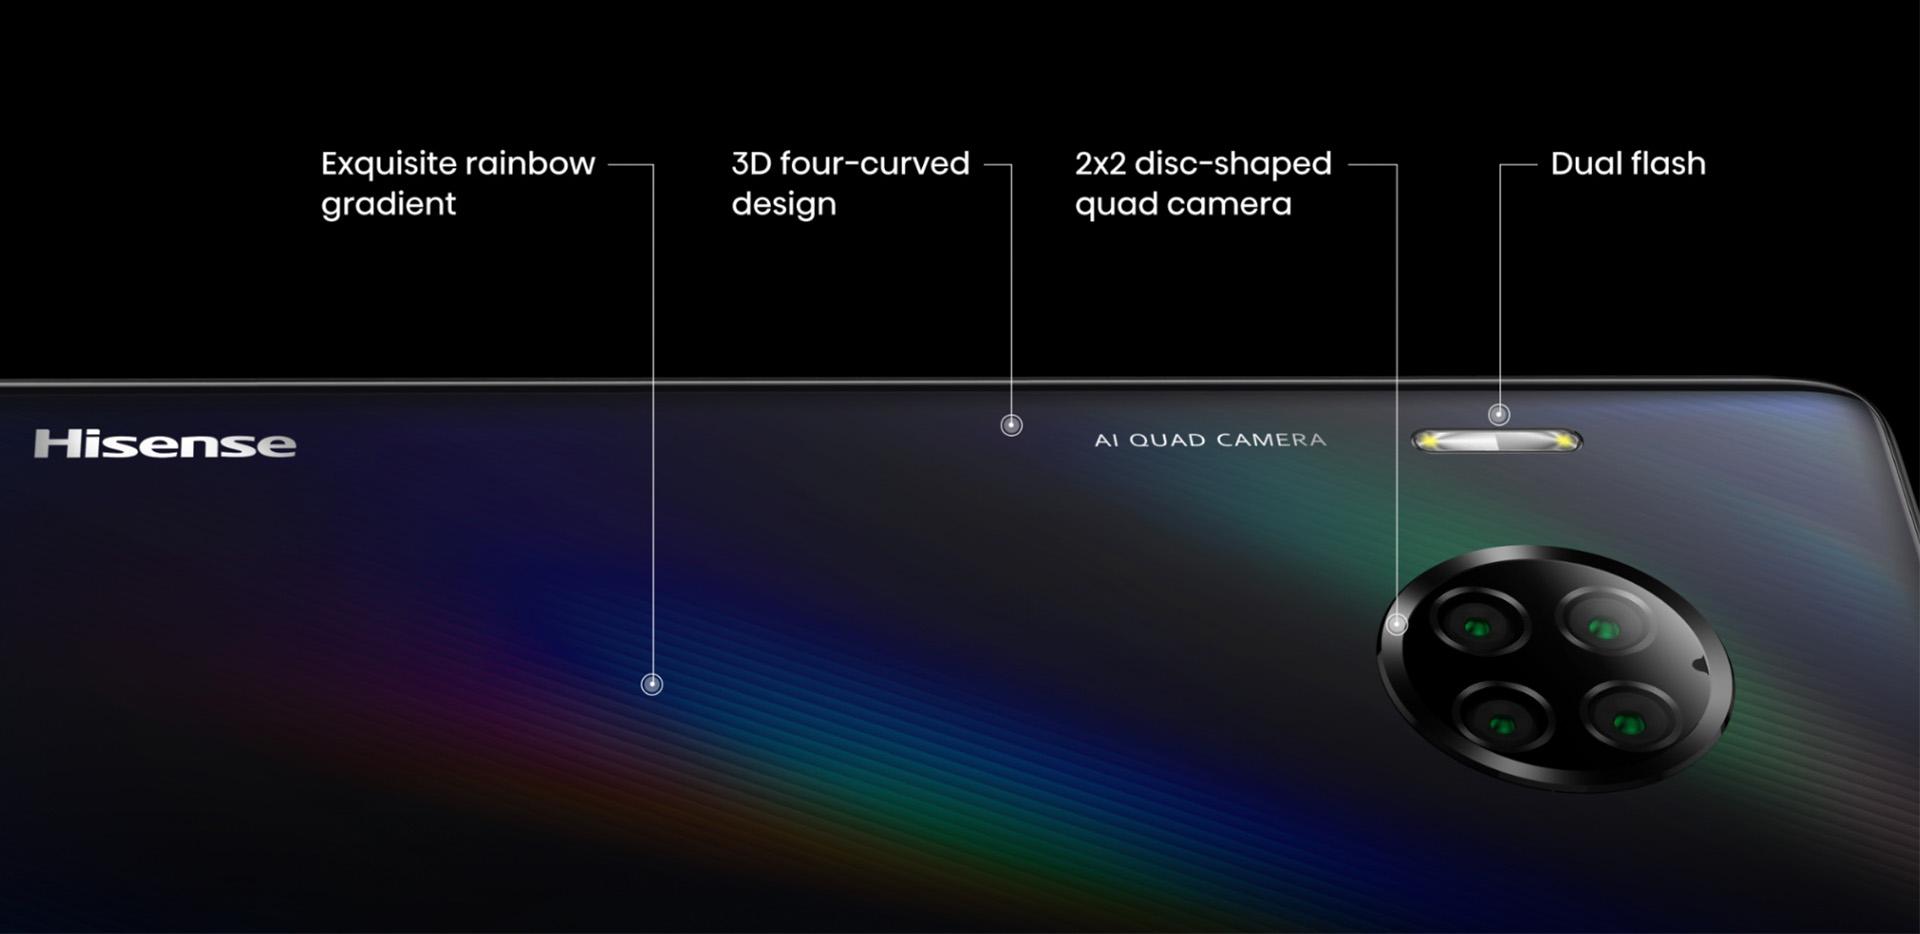 HISENSE INFINITY H50 ZOOM - THE DREAMLIKE LIGHT ART PIECE